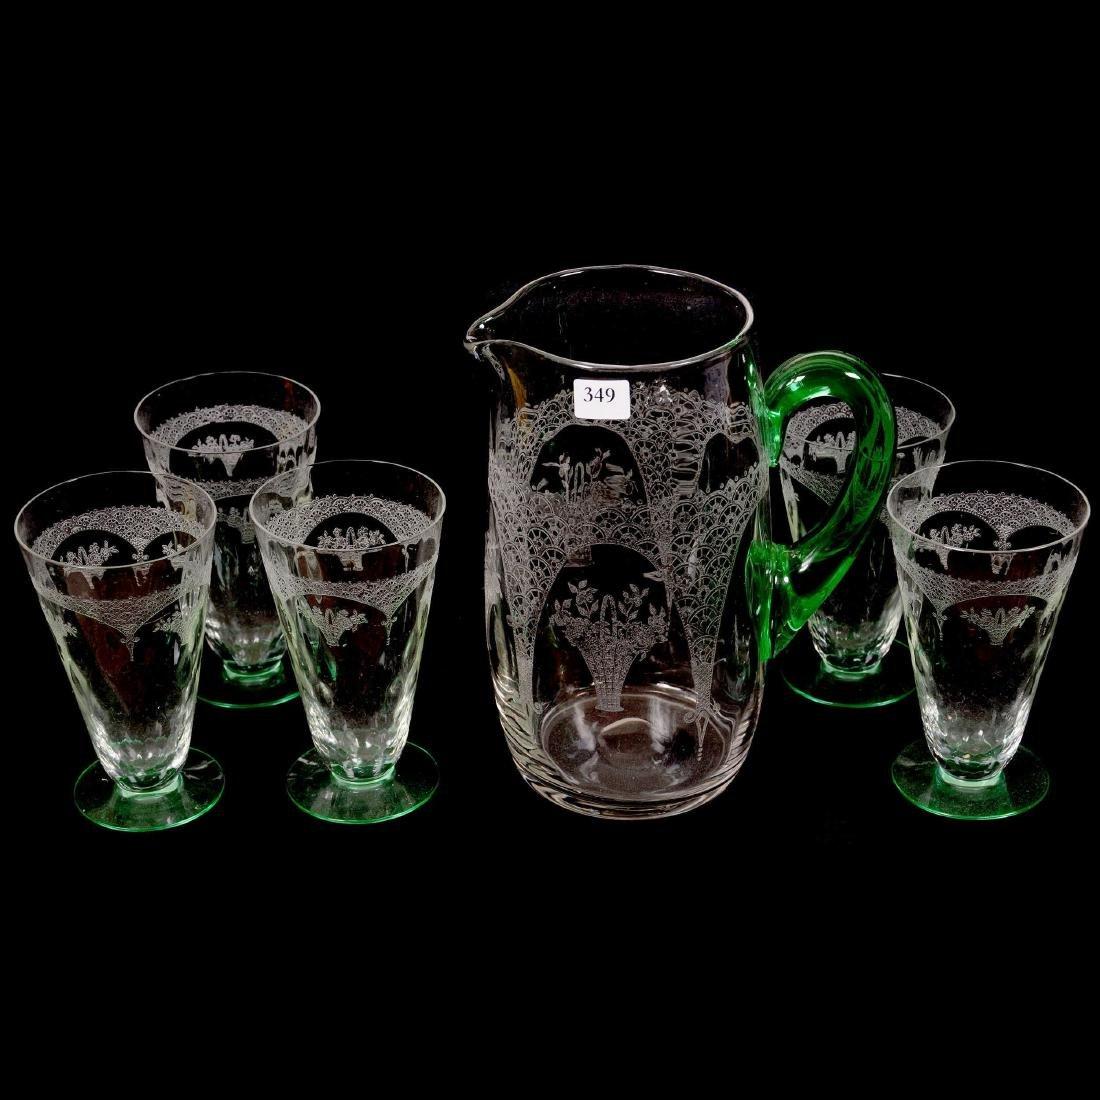 Six Piece Pitcher and Glass Set